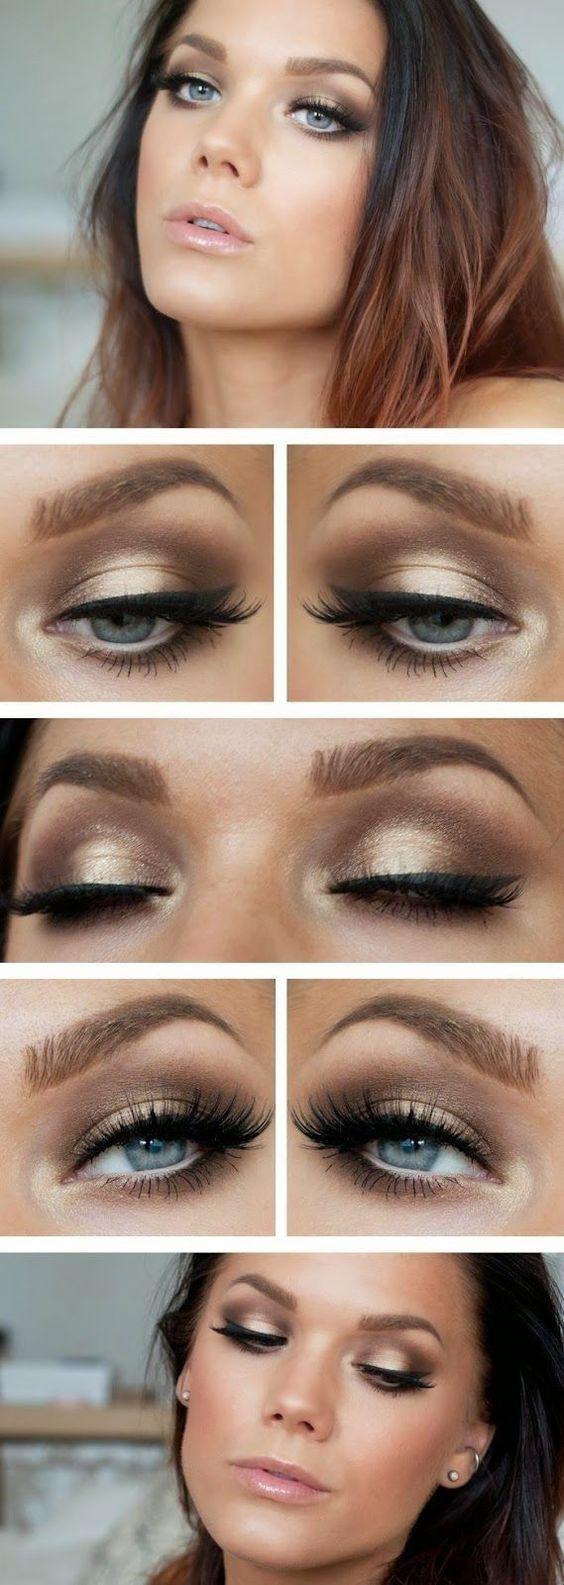 pezsgos_bronzos_makeup.jpg